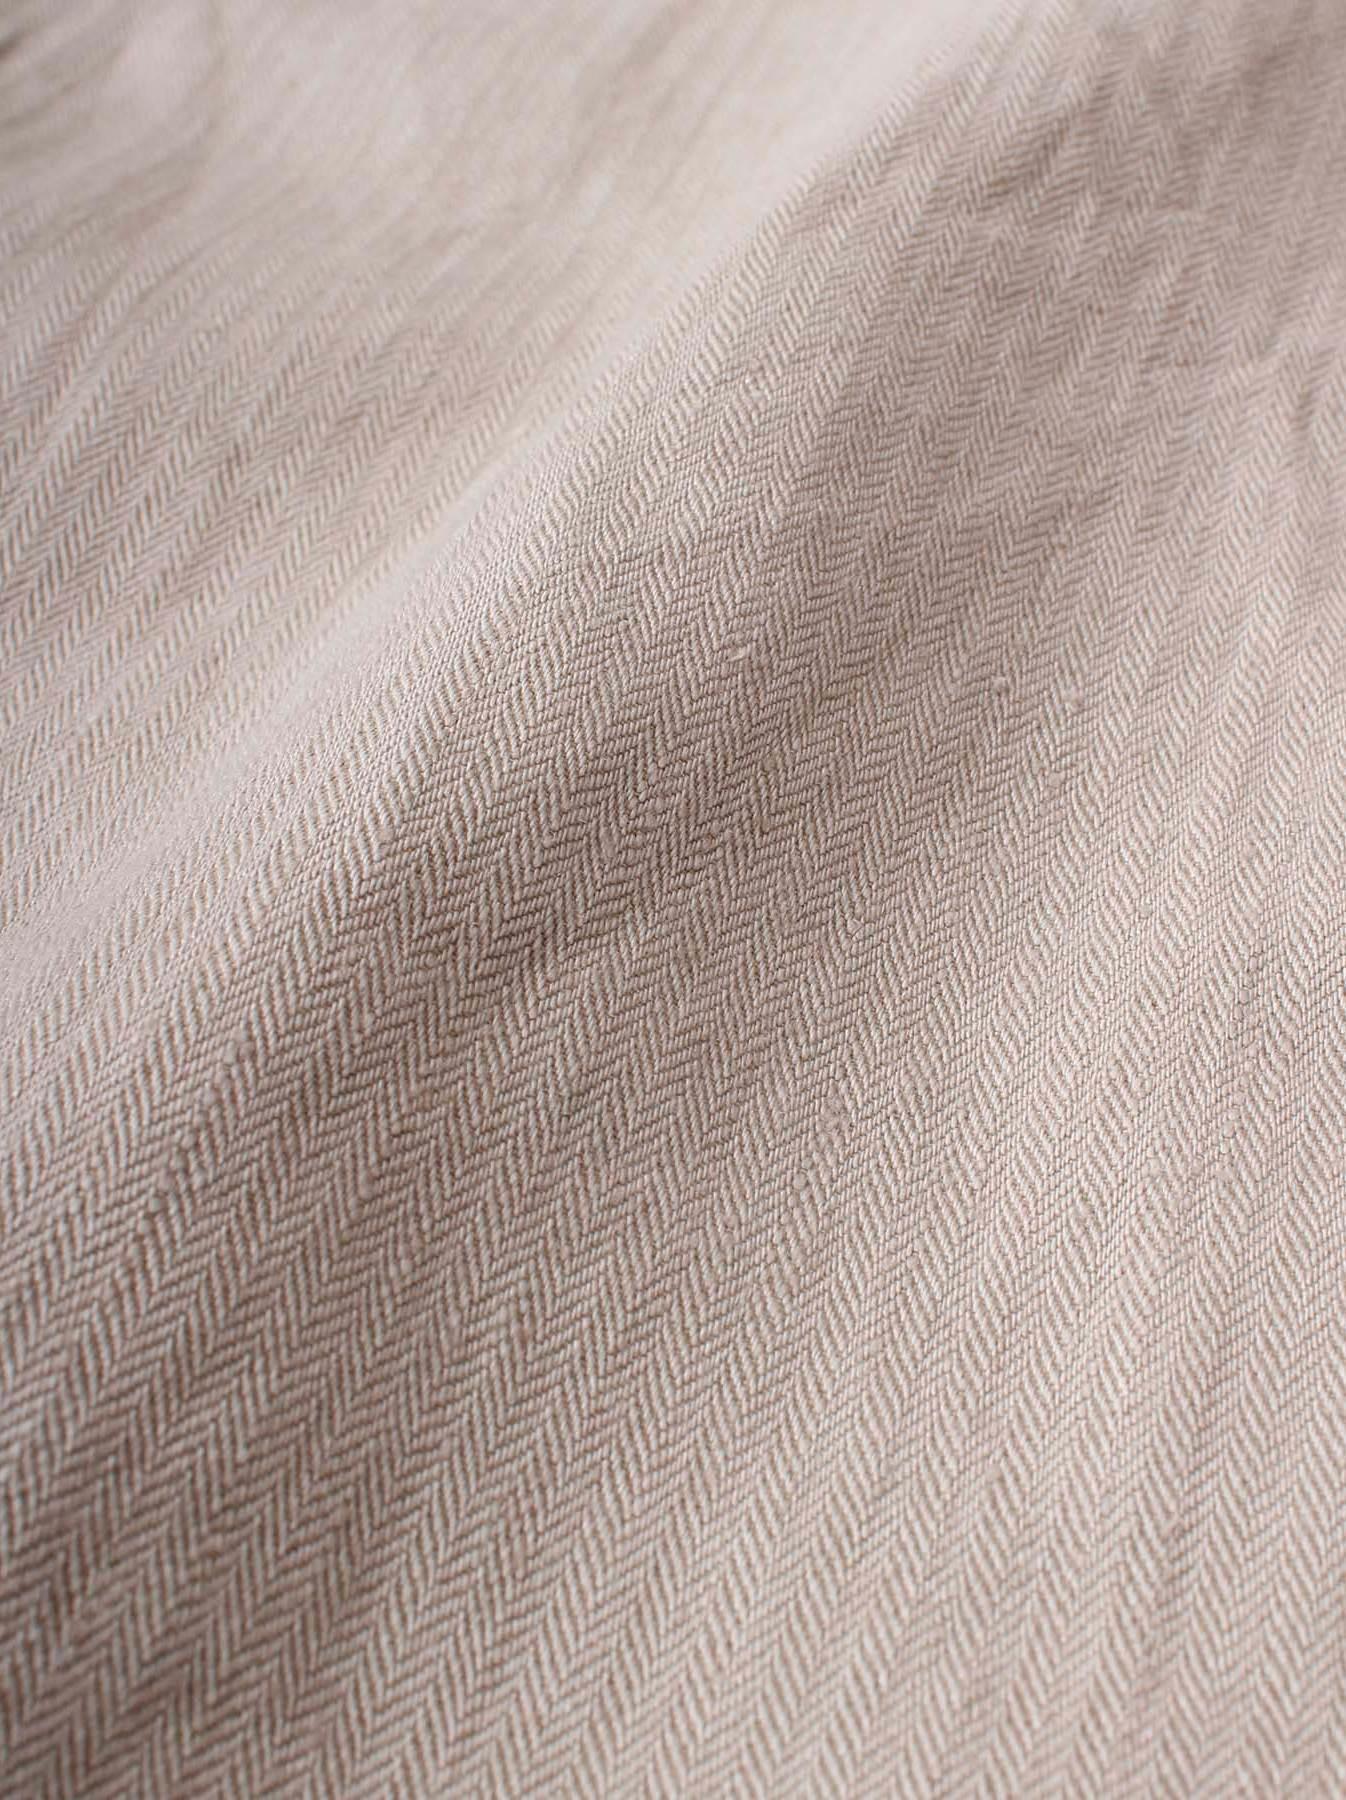 WH Linen Work3-6